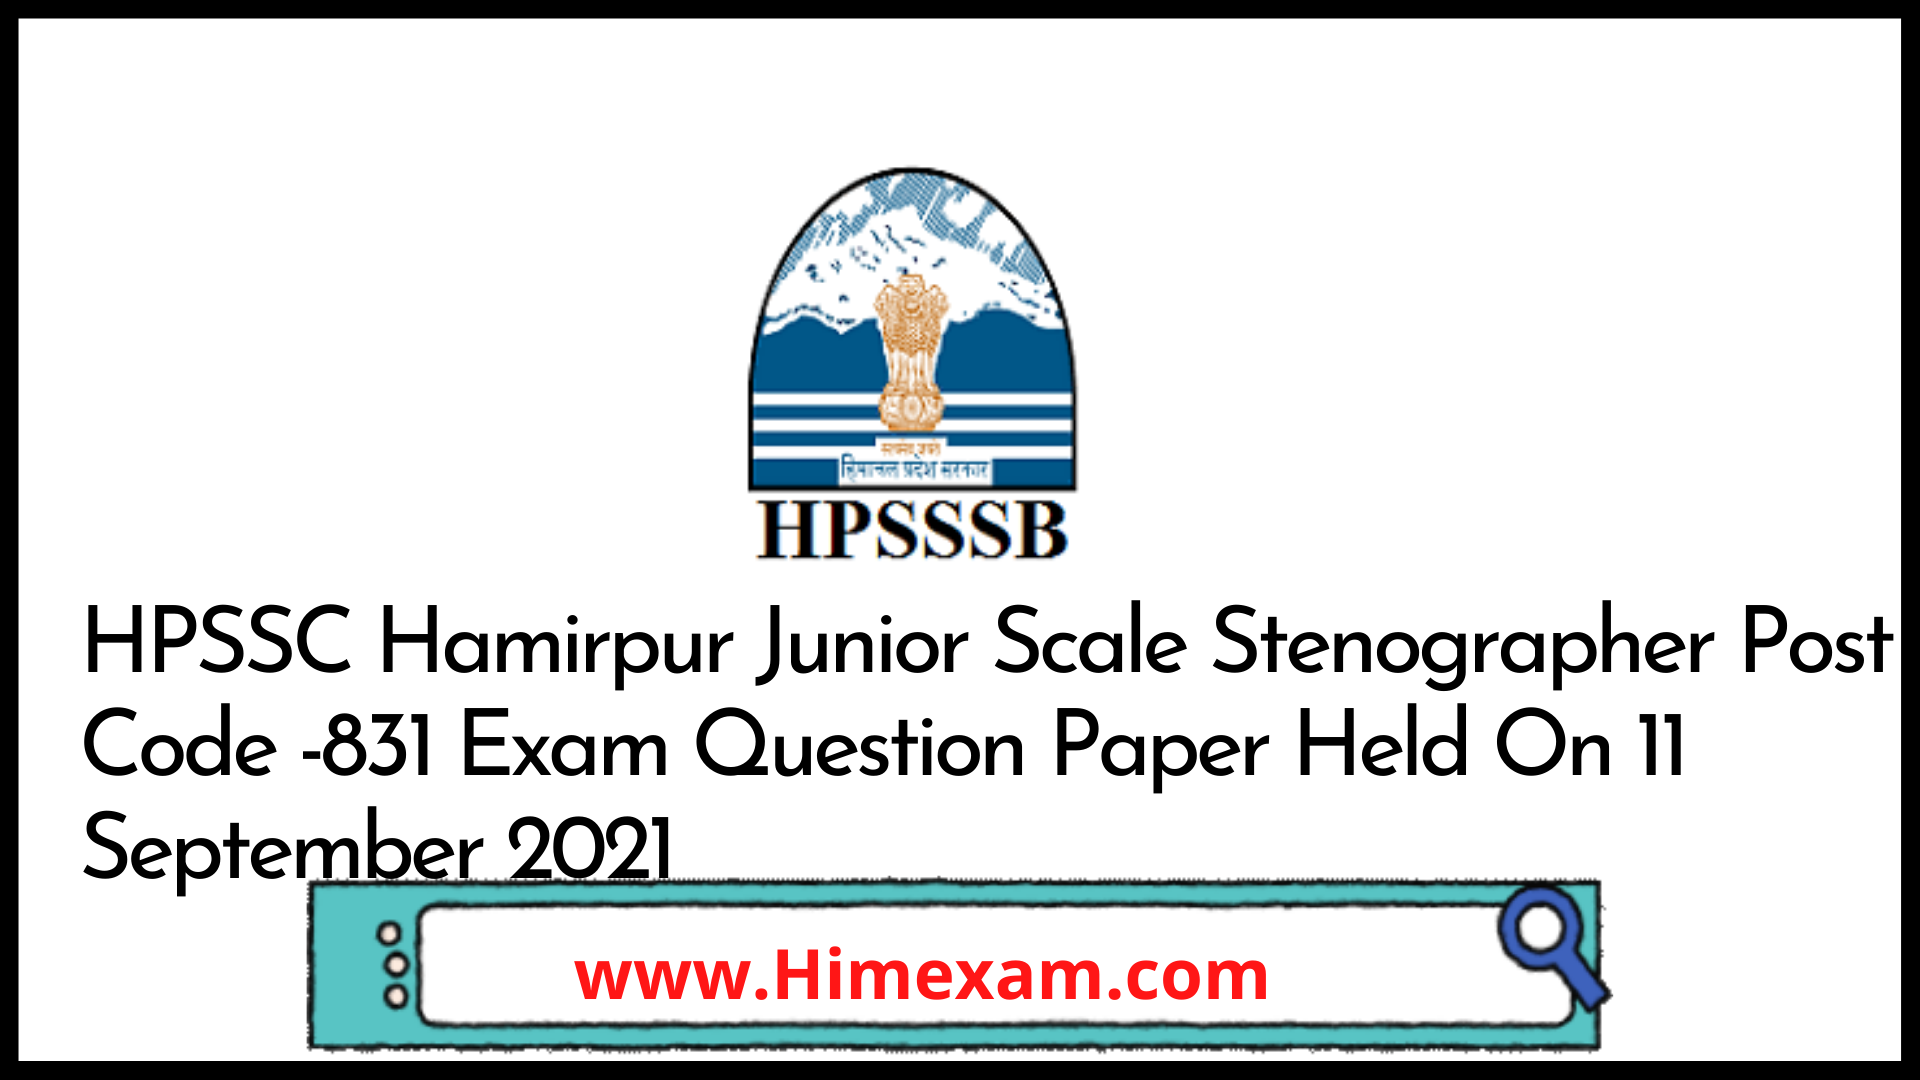 HPSSC Hamirpur Junior Scale Stenographer  Post Code -831 Exam Question Paper Held On 11 September 2021